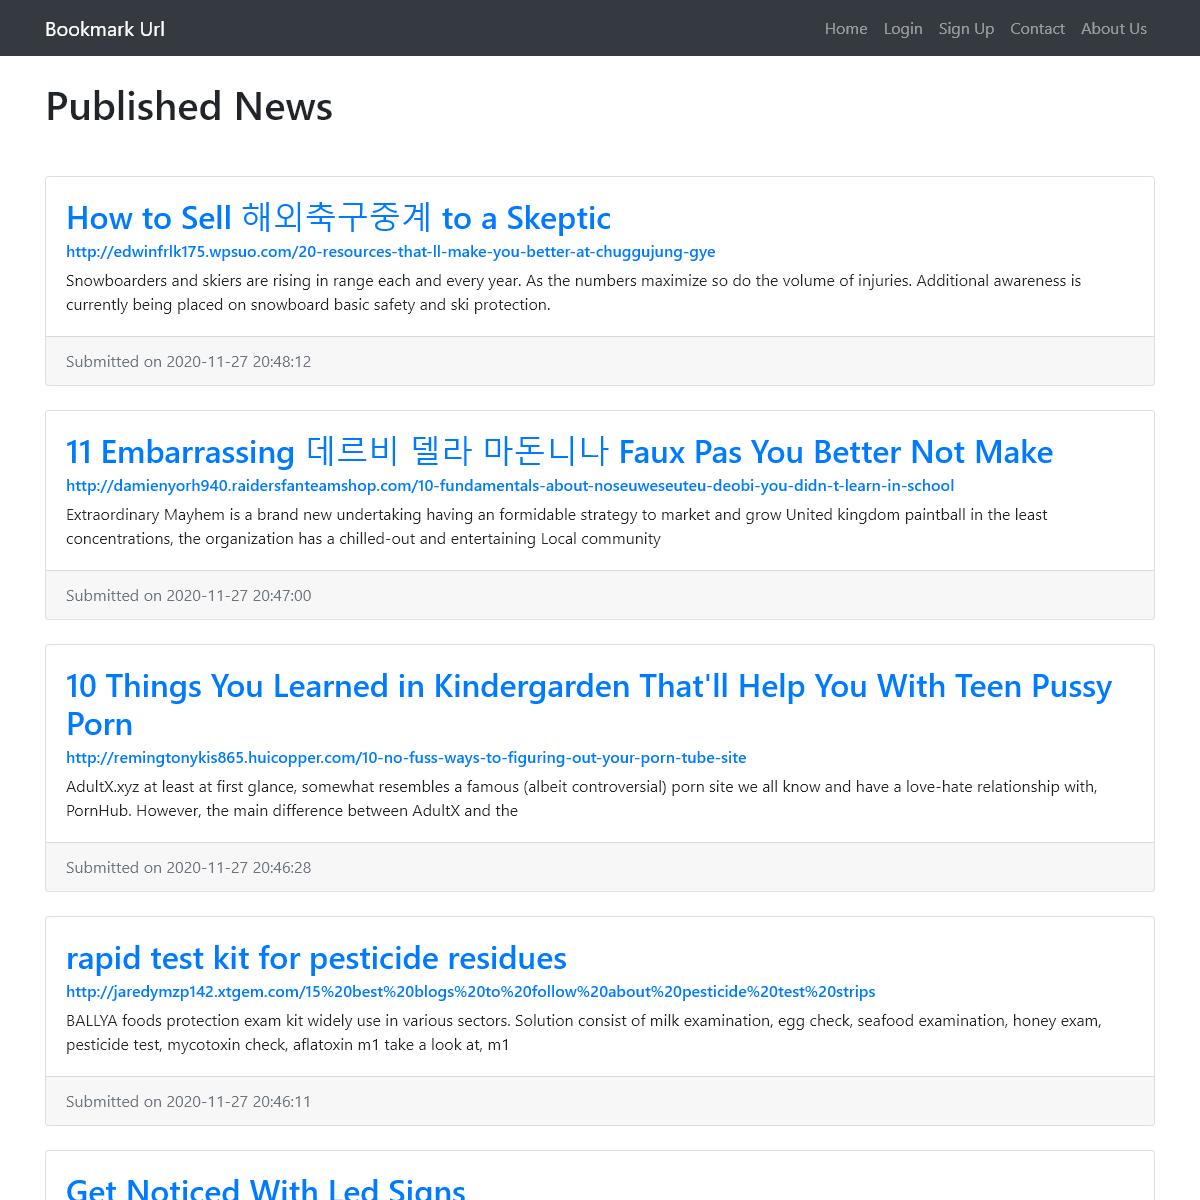 Published News - Bookmark Url